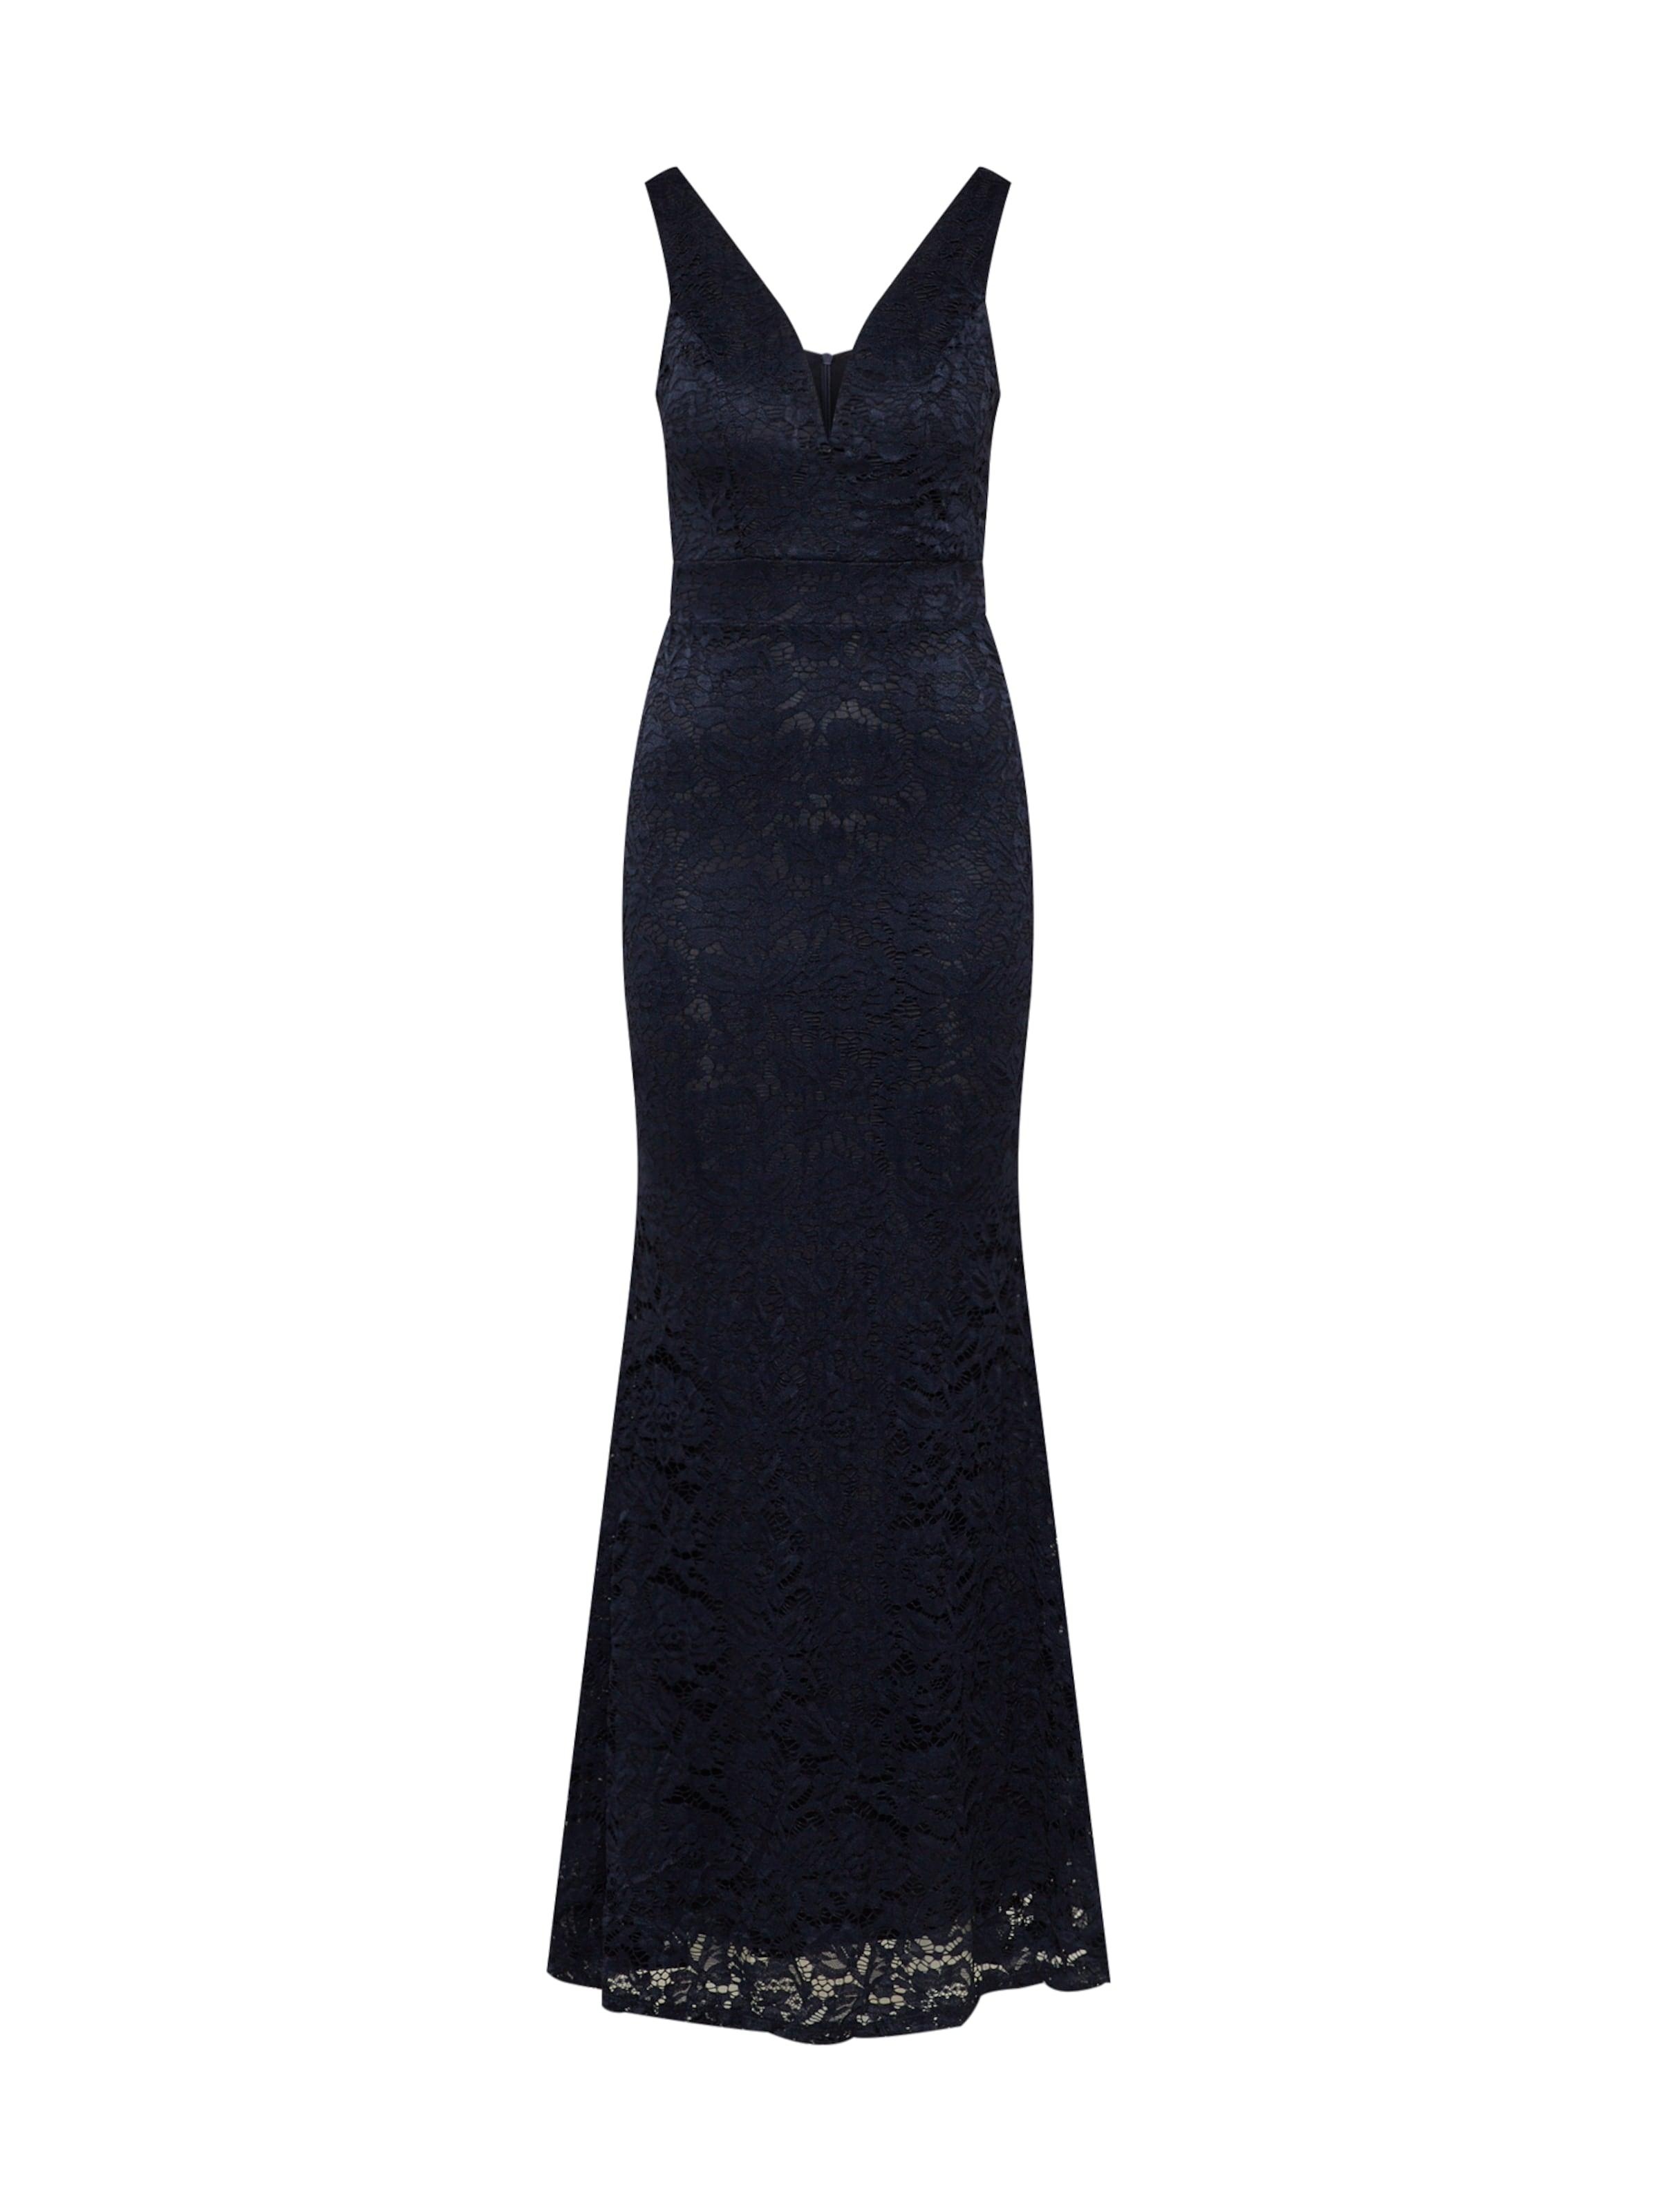 Wal Wal Wal Wal Nachtblau GAbendkleid Nachtblau Nachtblau GAbendkleid In GAbendkleid In In GAbendkleid eD29HIWEY